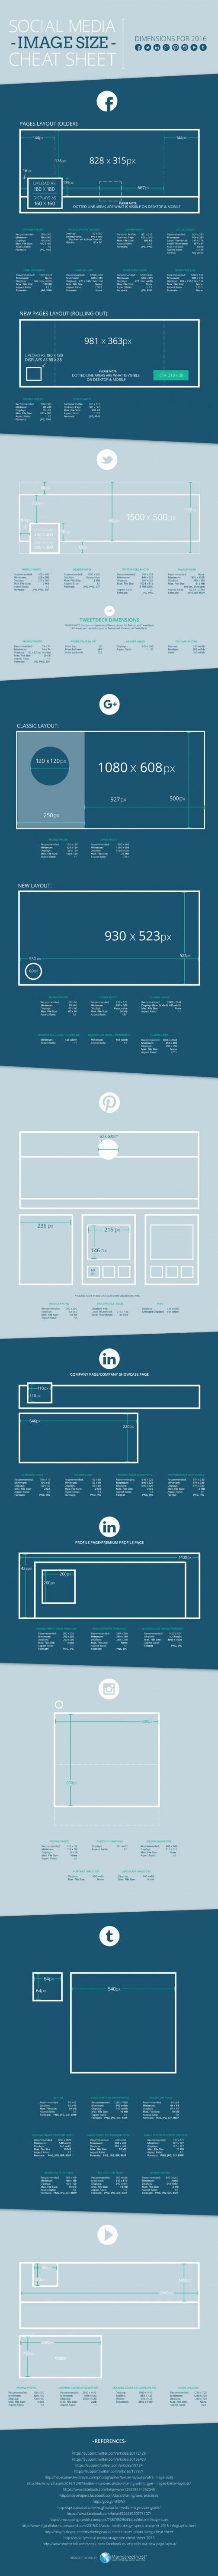 infografia social-cheat-sheet-infographic